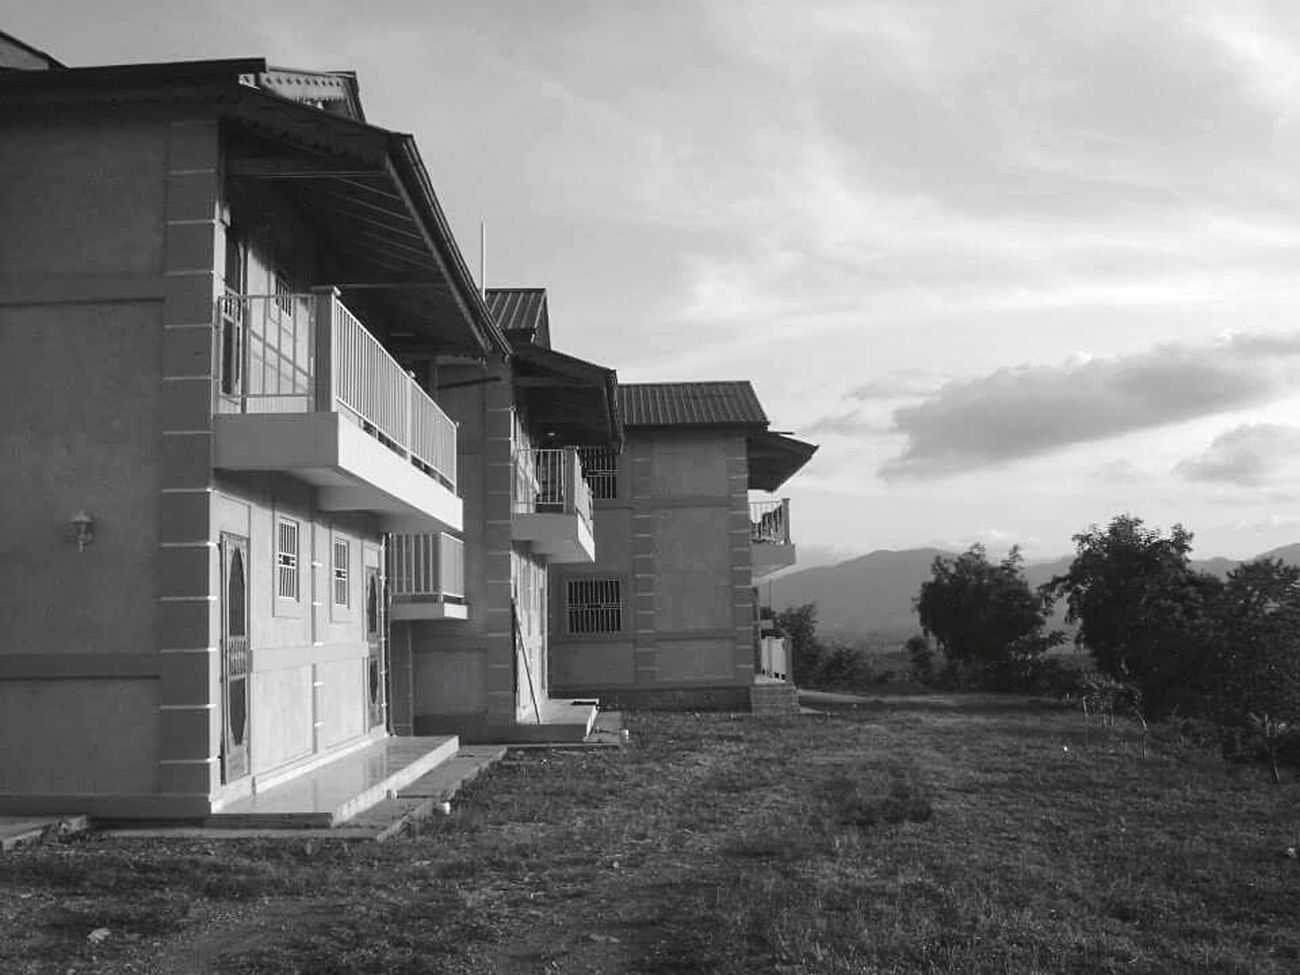 The Architect - 2015 EyeEm Awards This Is Haiti Haiti Haitian Cap Haitien Missing Haiti Architecture Mission Trip